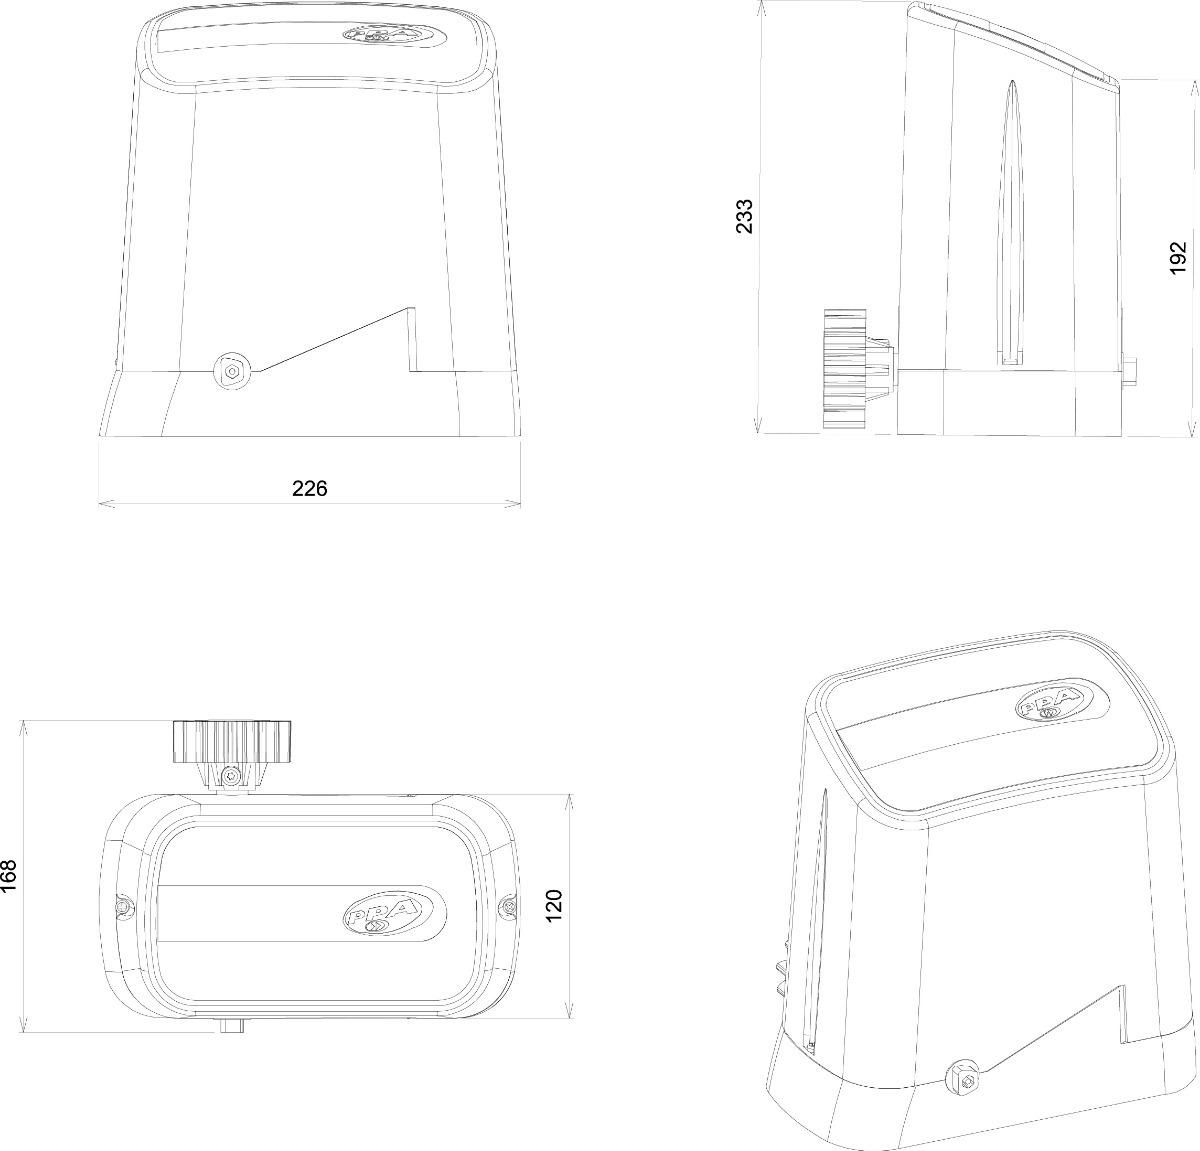 Kit Motor Portao Automatizador Deslizante Dz Home 1 4 Hp